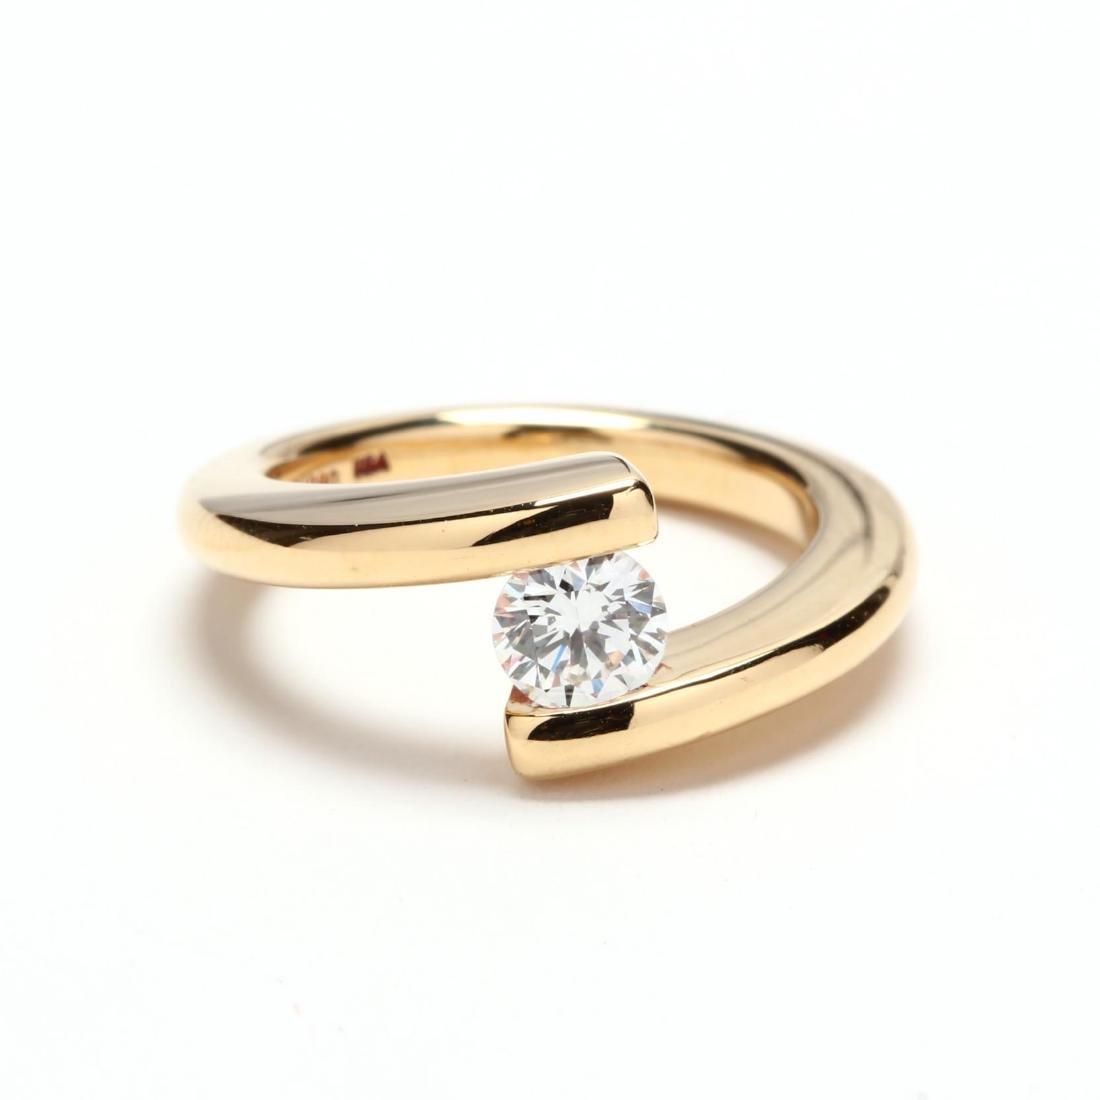 18KT Gold and Diamond Ring, Steve Kretchmer